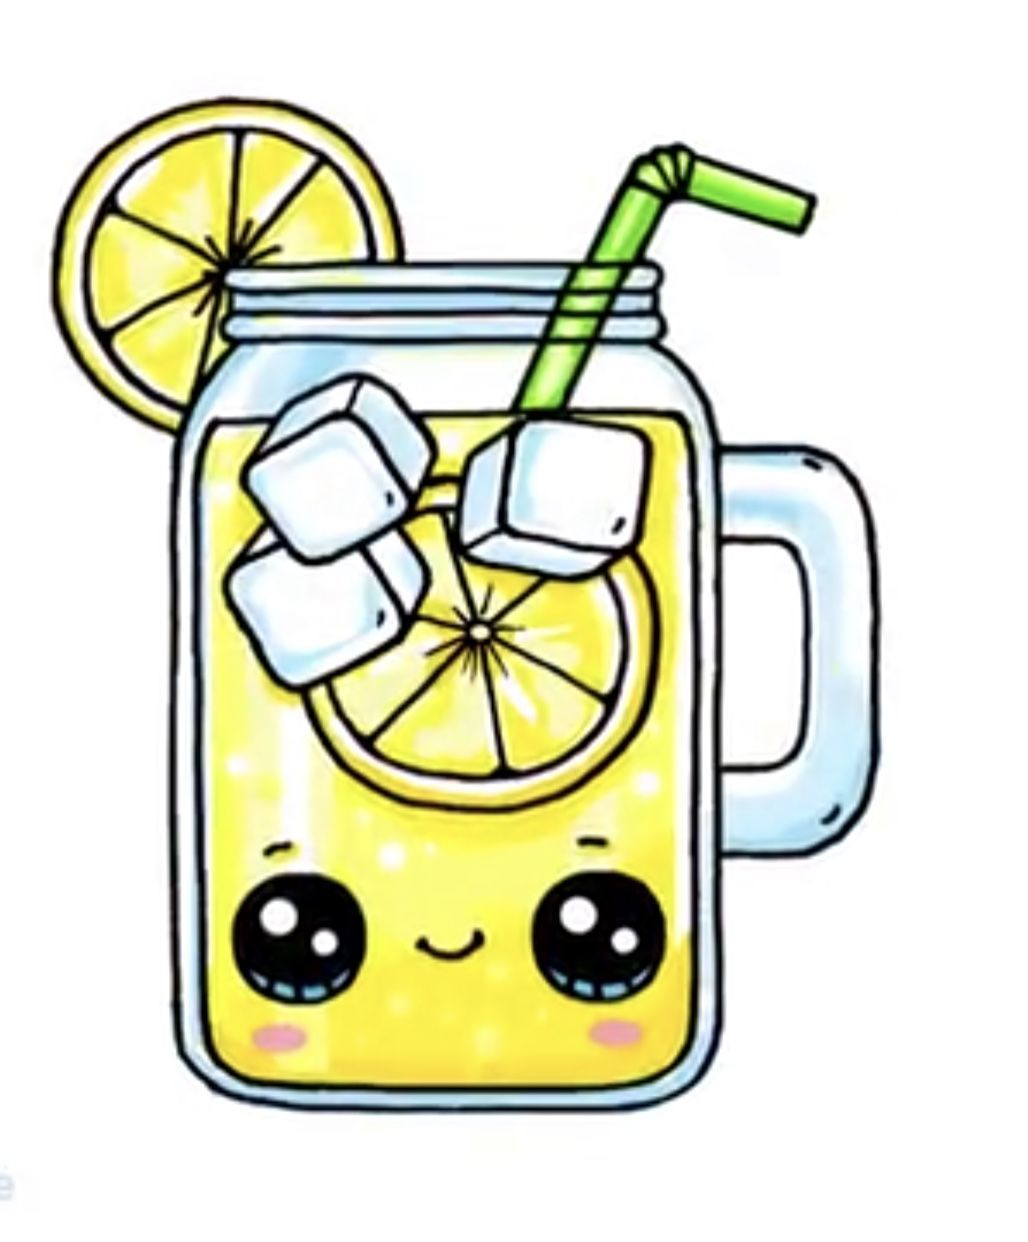 Kawaii Food Drawings : kawaii, drawings, Lemonade#lemonade, Kawaii, Drawings,, Doodles,, Drawings